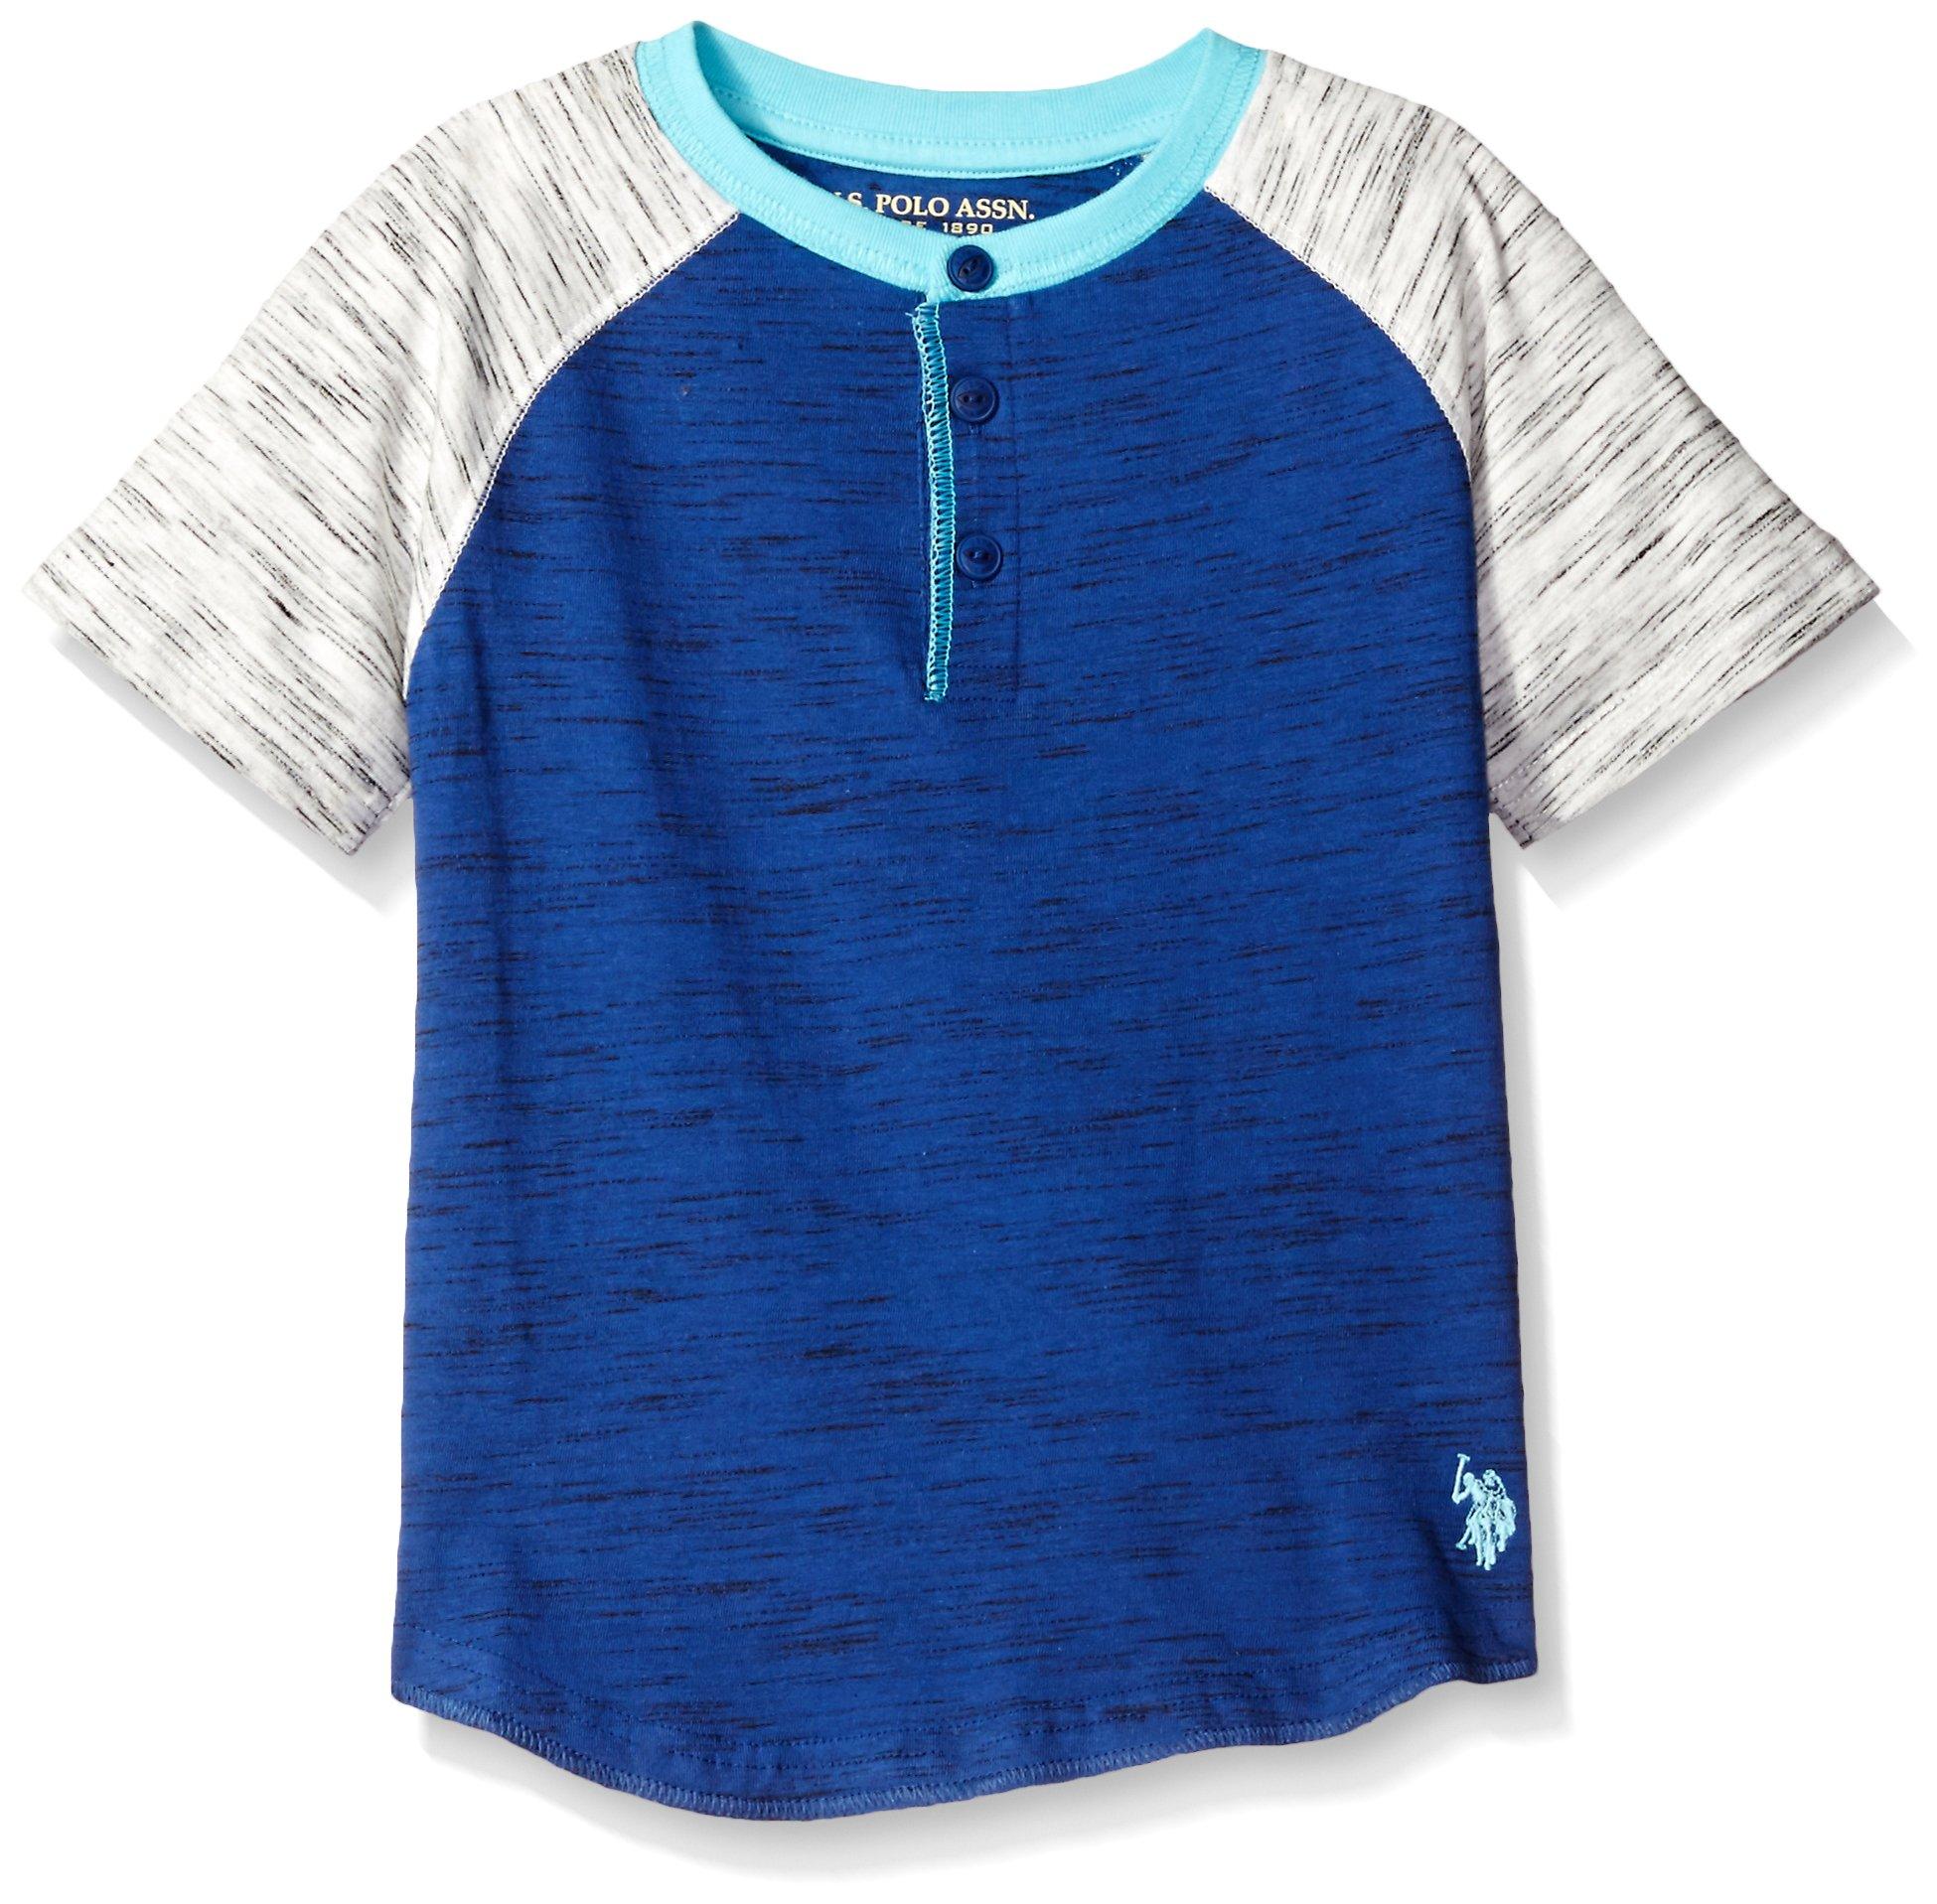 U.S. Polo Assn. Boys' Short Sleeve Henley,Marina Blue Injeaction H5HA26IAV,5/6